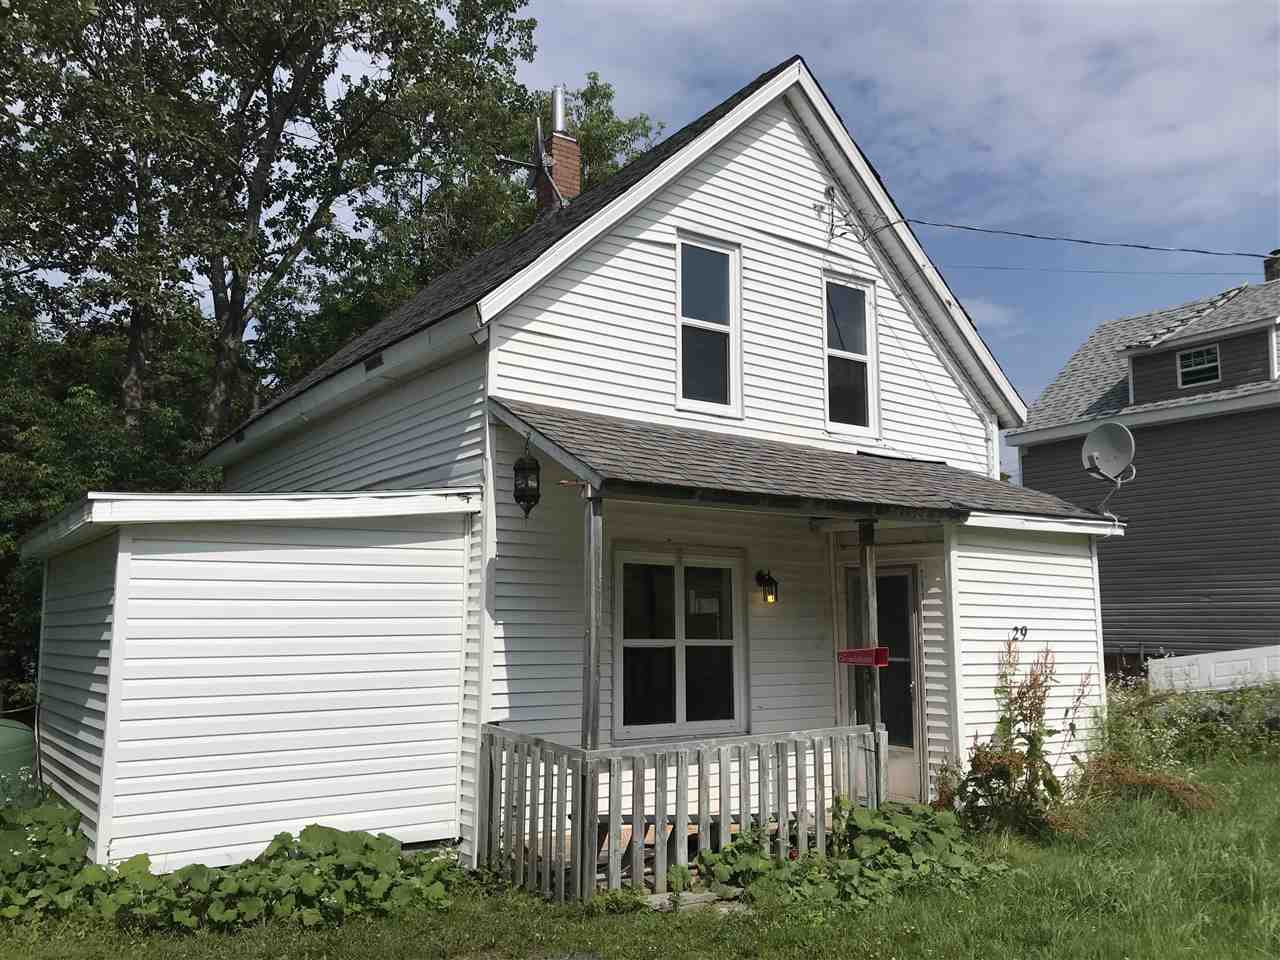 Main Photo: 29 Spruce Street in Trenton: 107-Trenton,Westville,Pictou Residential for sale (Northern Region)  : MLS®# 201918722